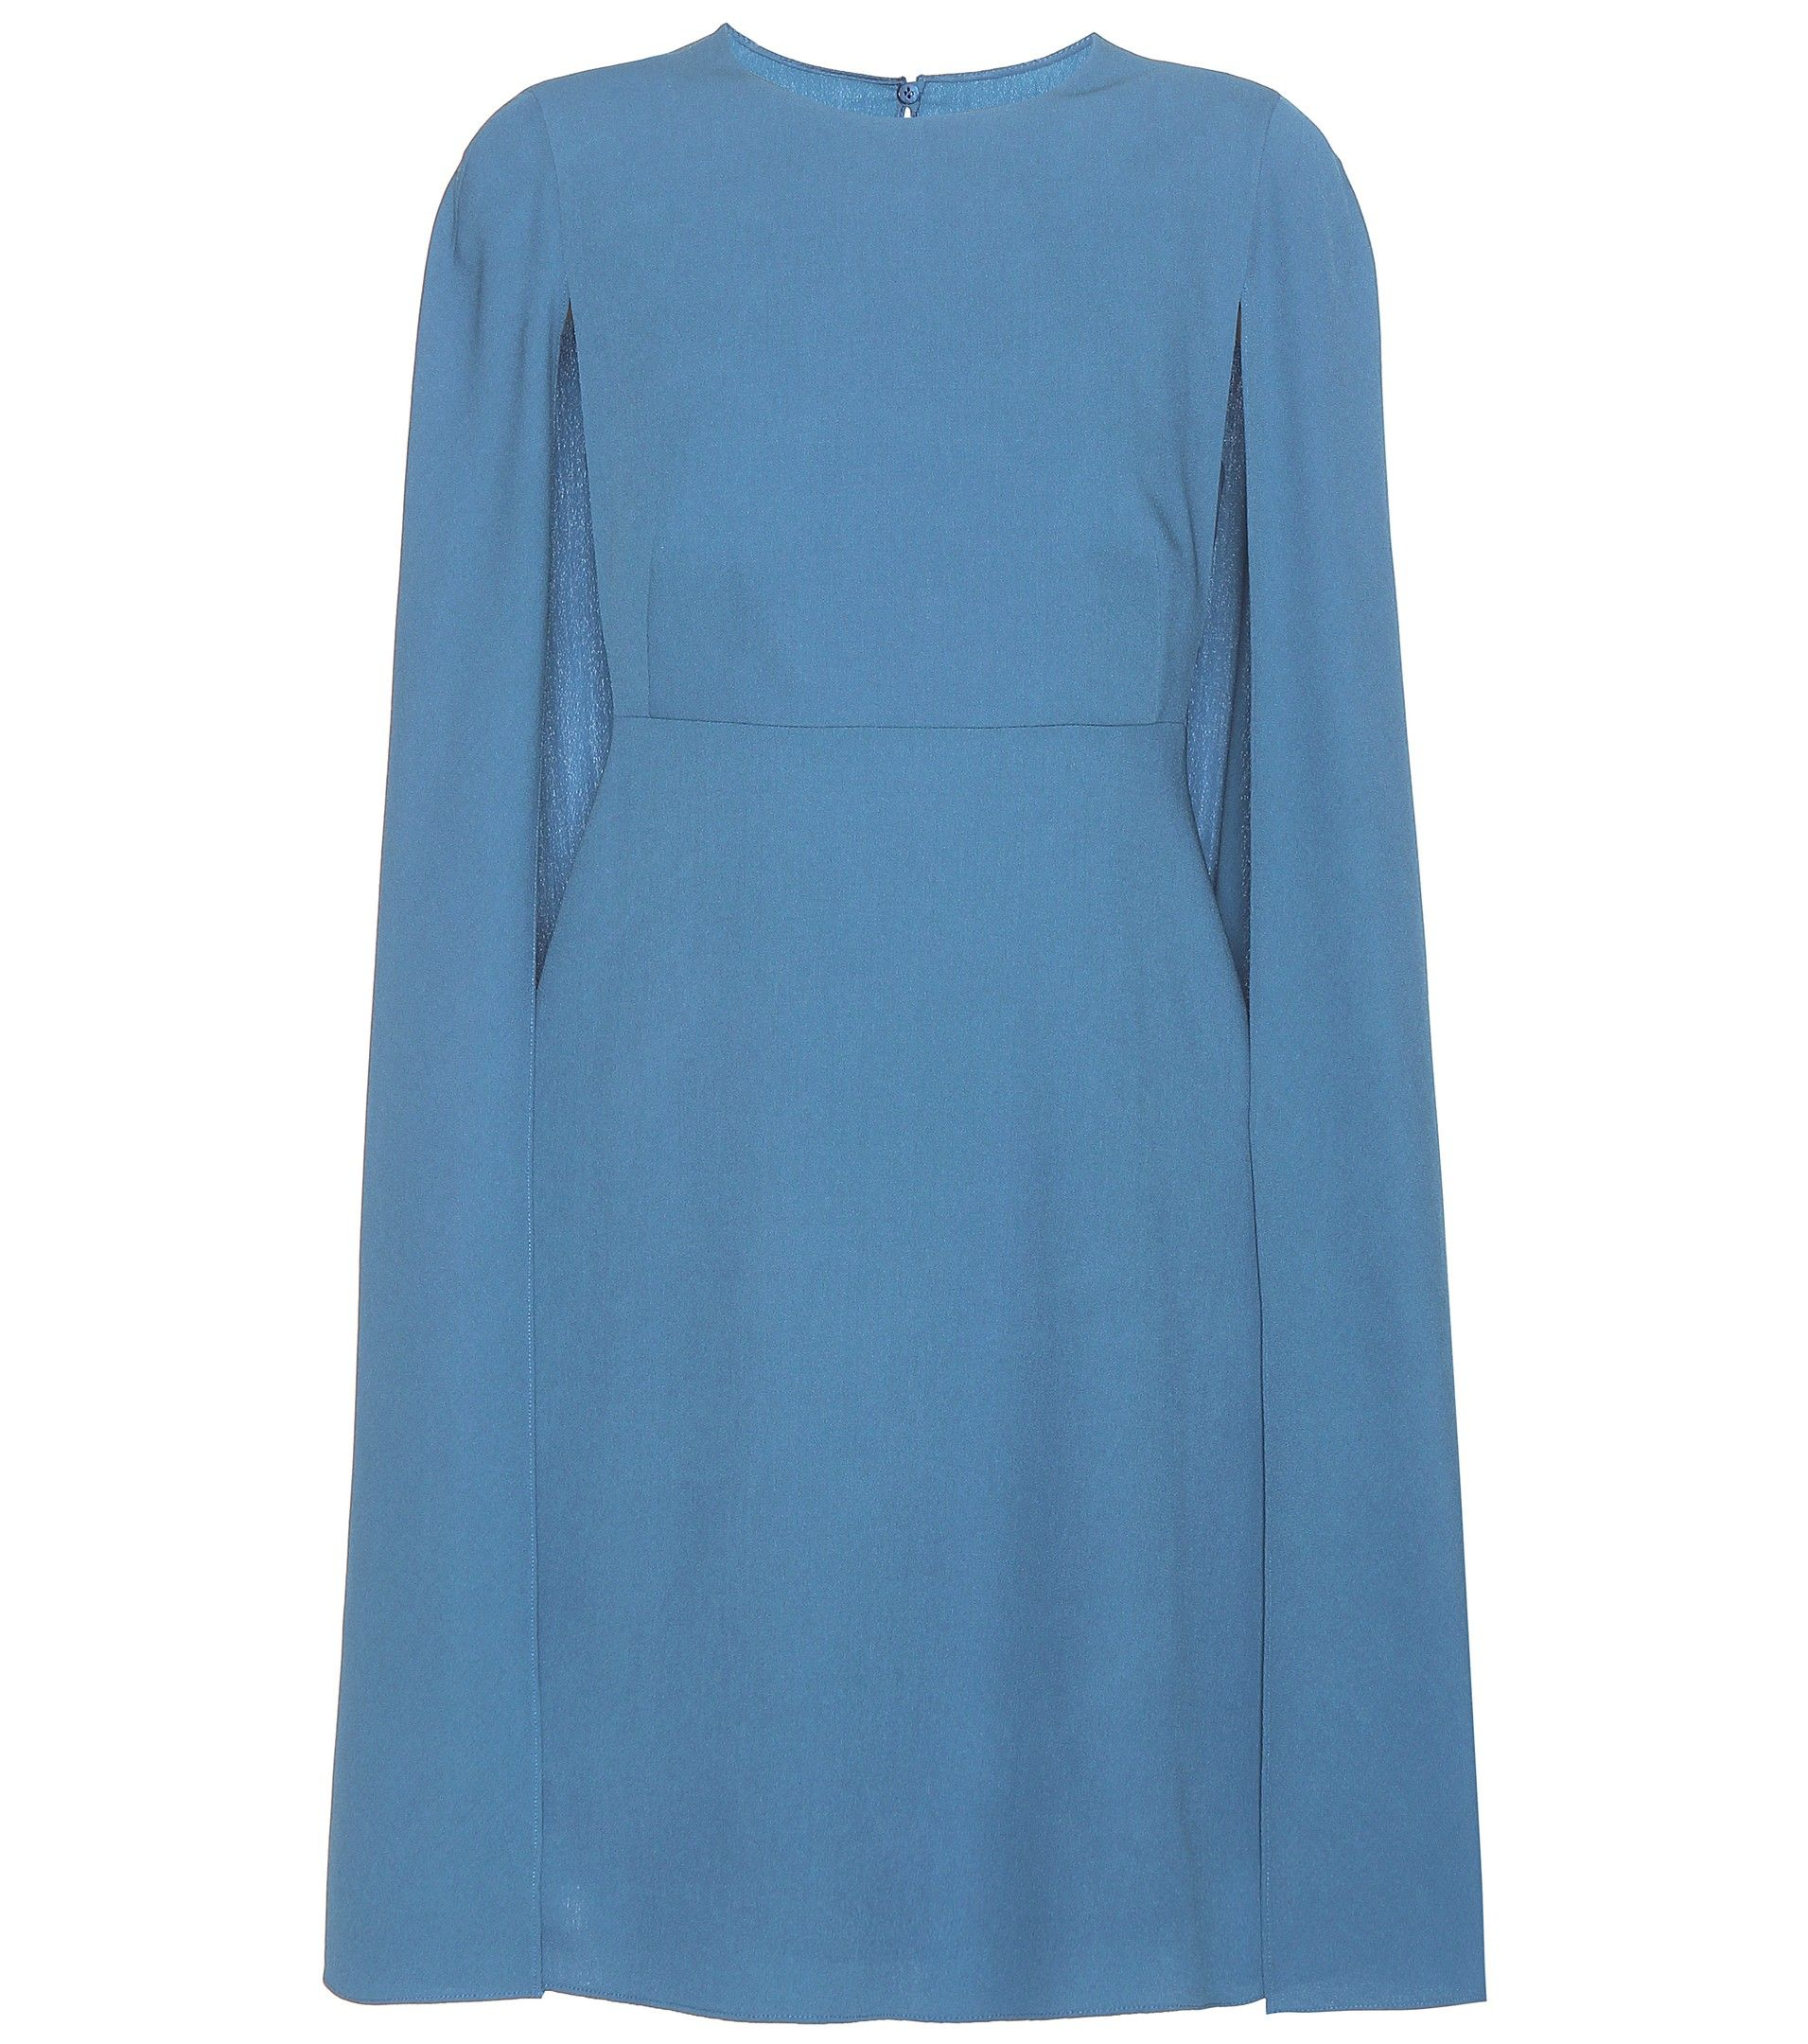 mytheresa.com - Wool Cape Dress ► Valentino | mytheresa.com - Luxury Fashion for Women / Designer clothing, shoes, bags